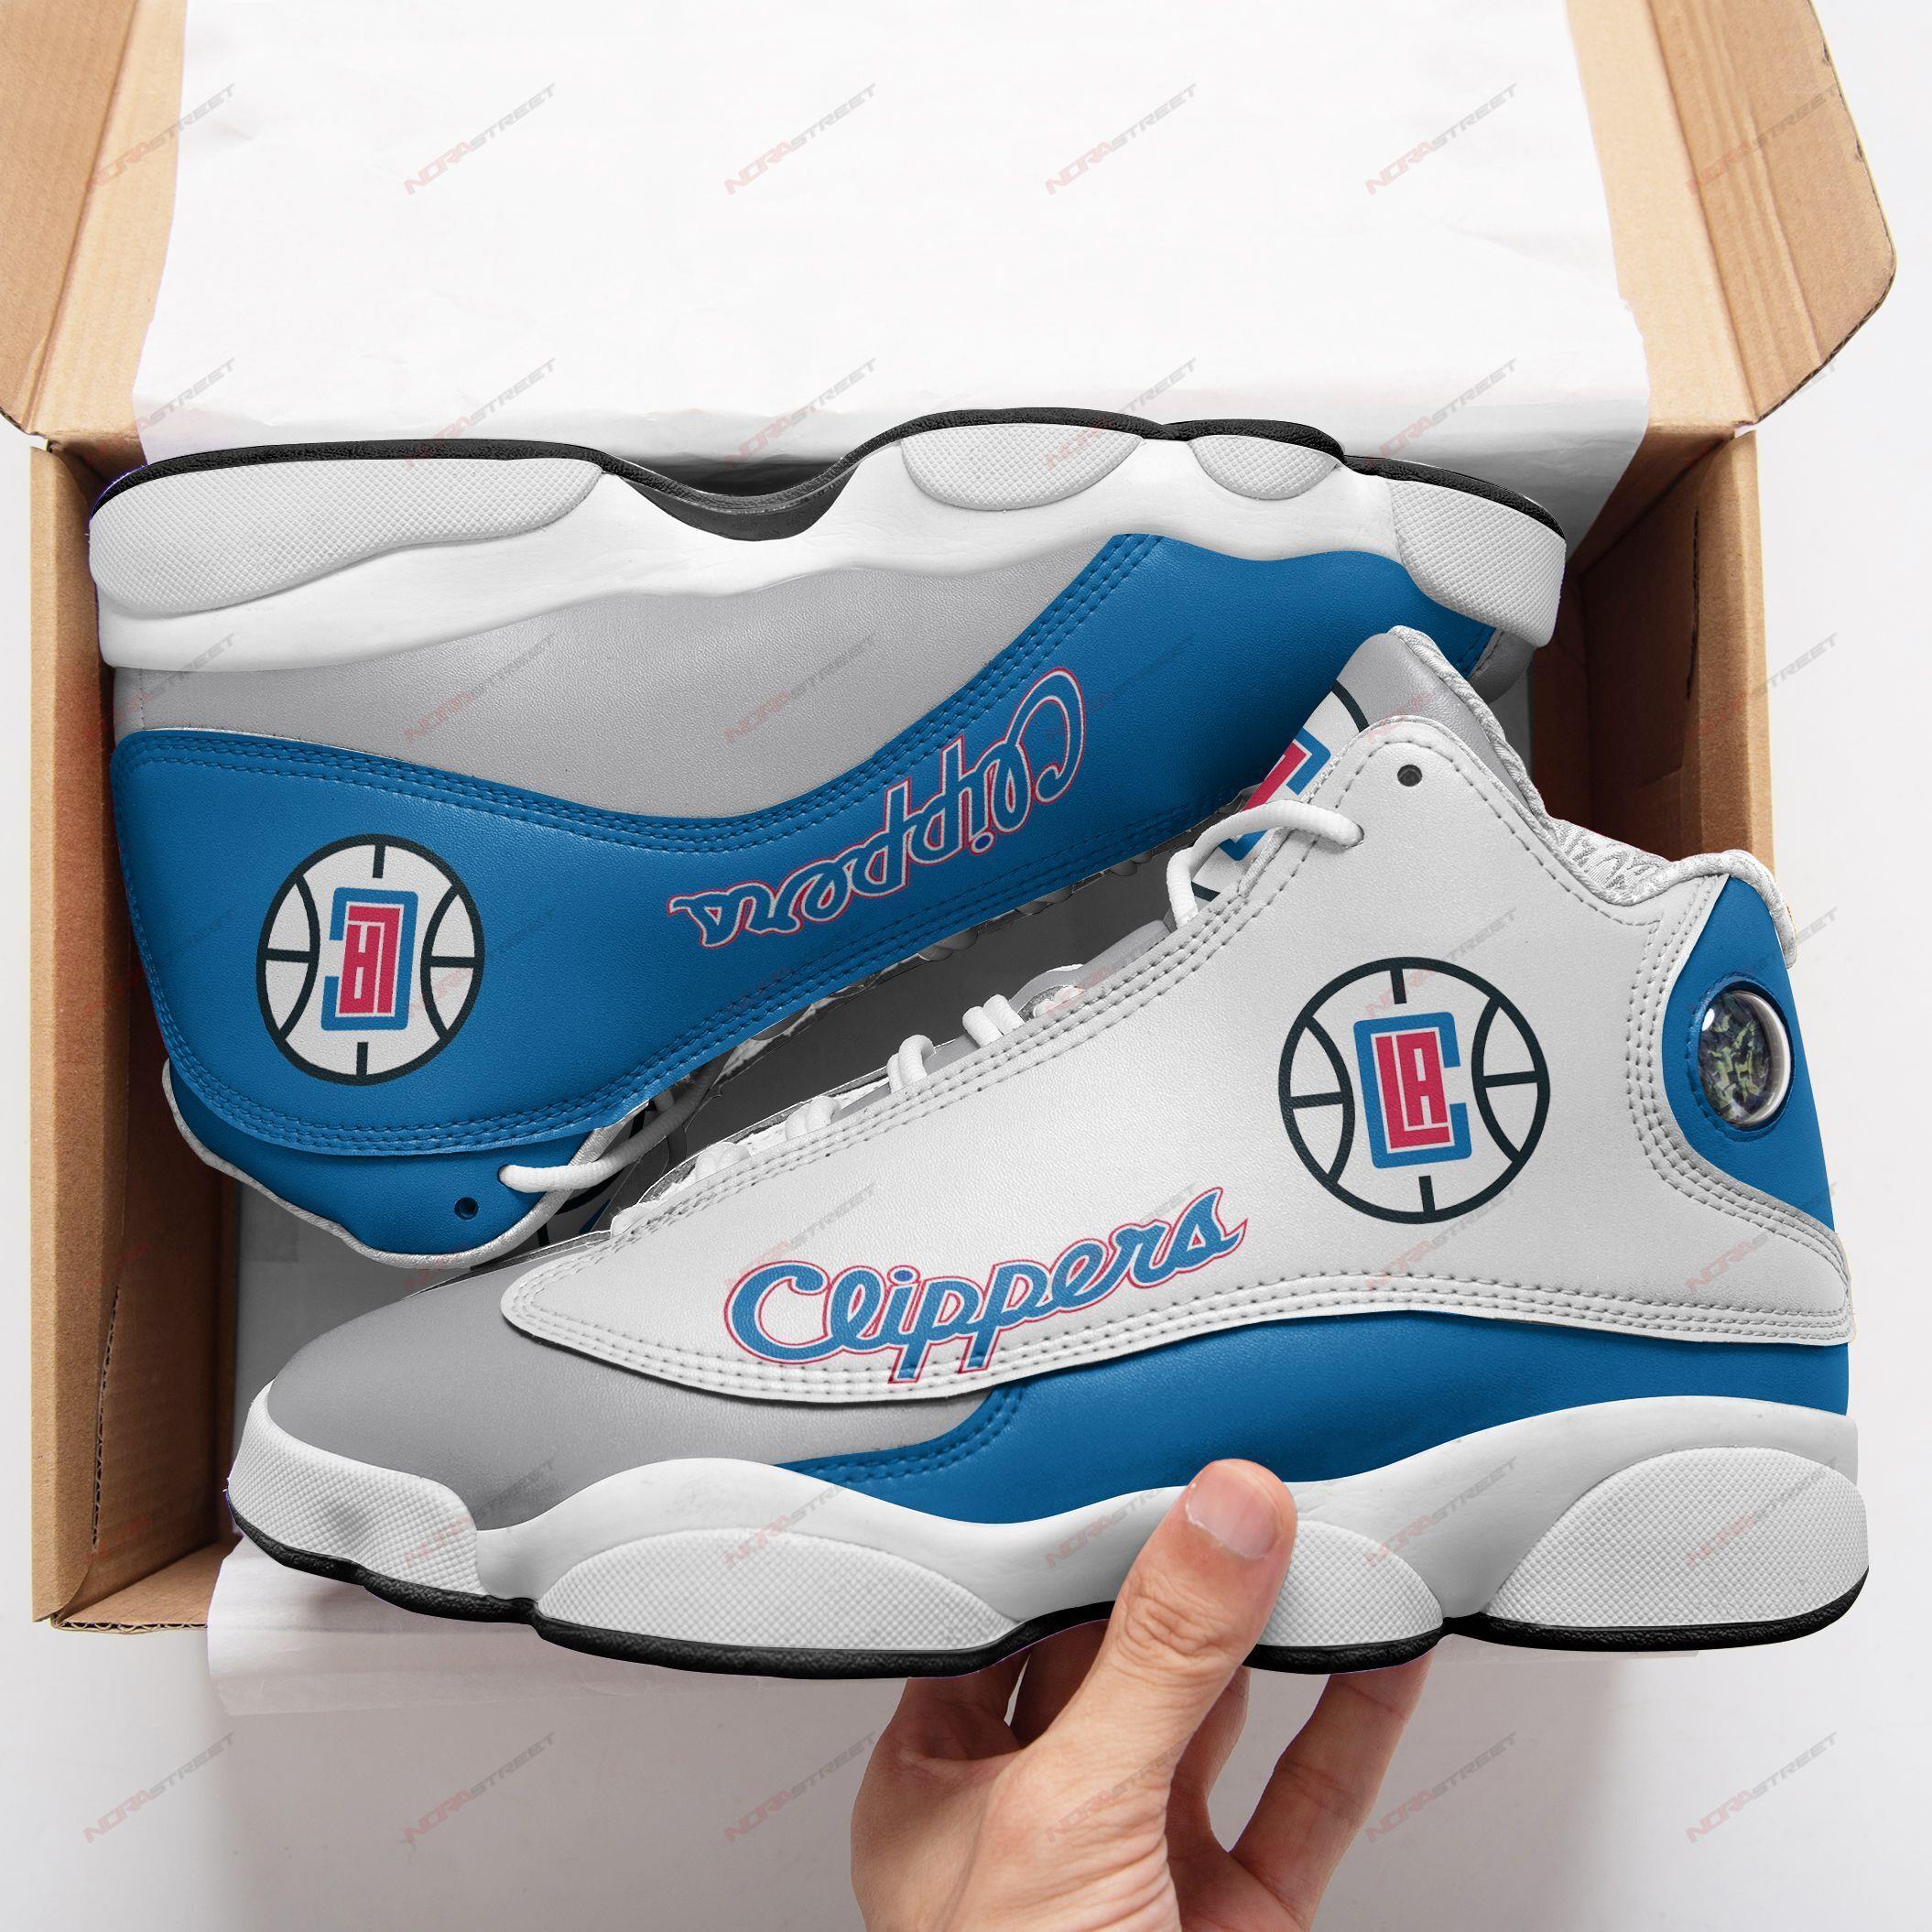 Los Angeles Clippers Air Jordan 13 Sneakers Sport Shoes Plus Size